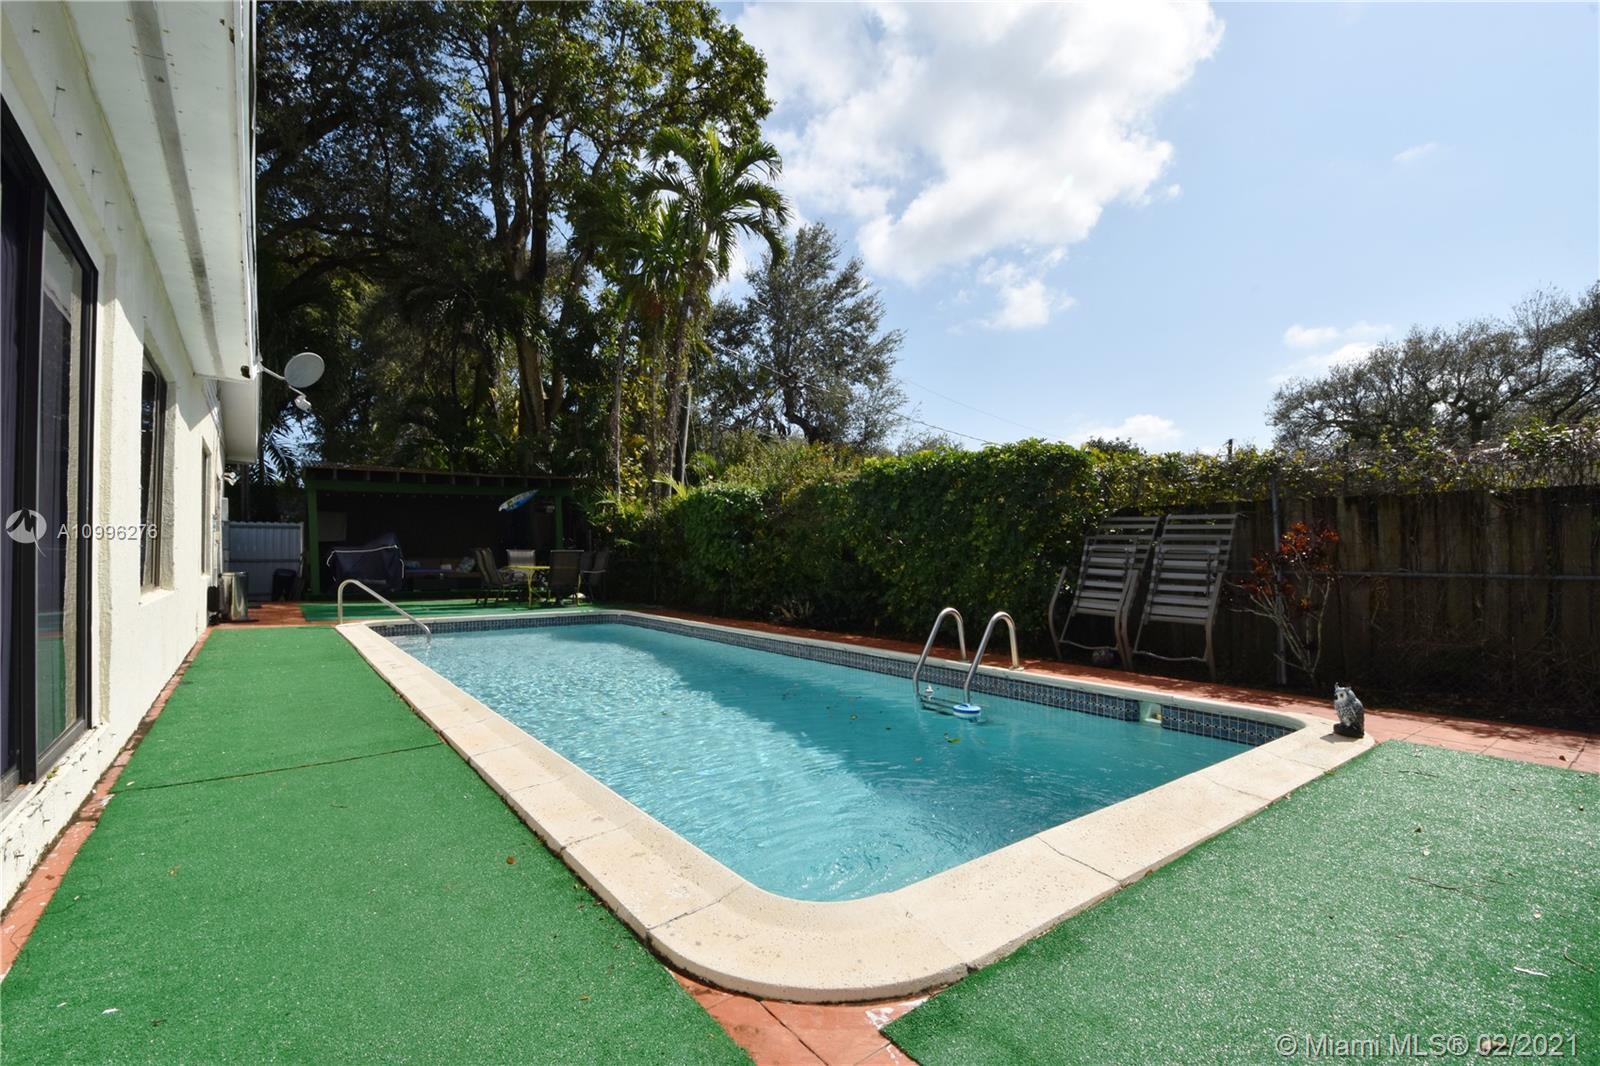 Sky Lake, 2110 NE 191st Dr, North Miami Beach, Florida 33179, image 38